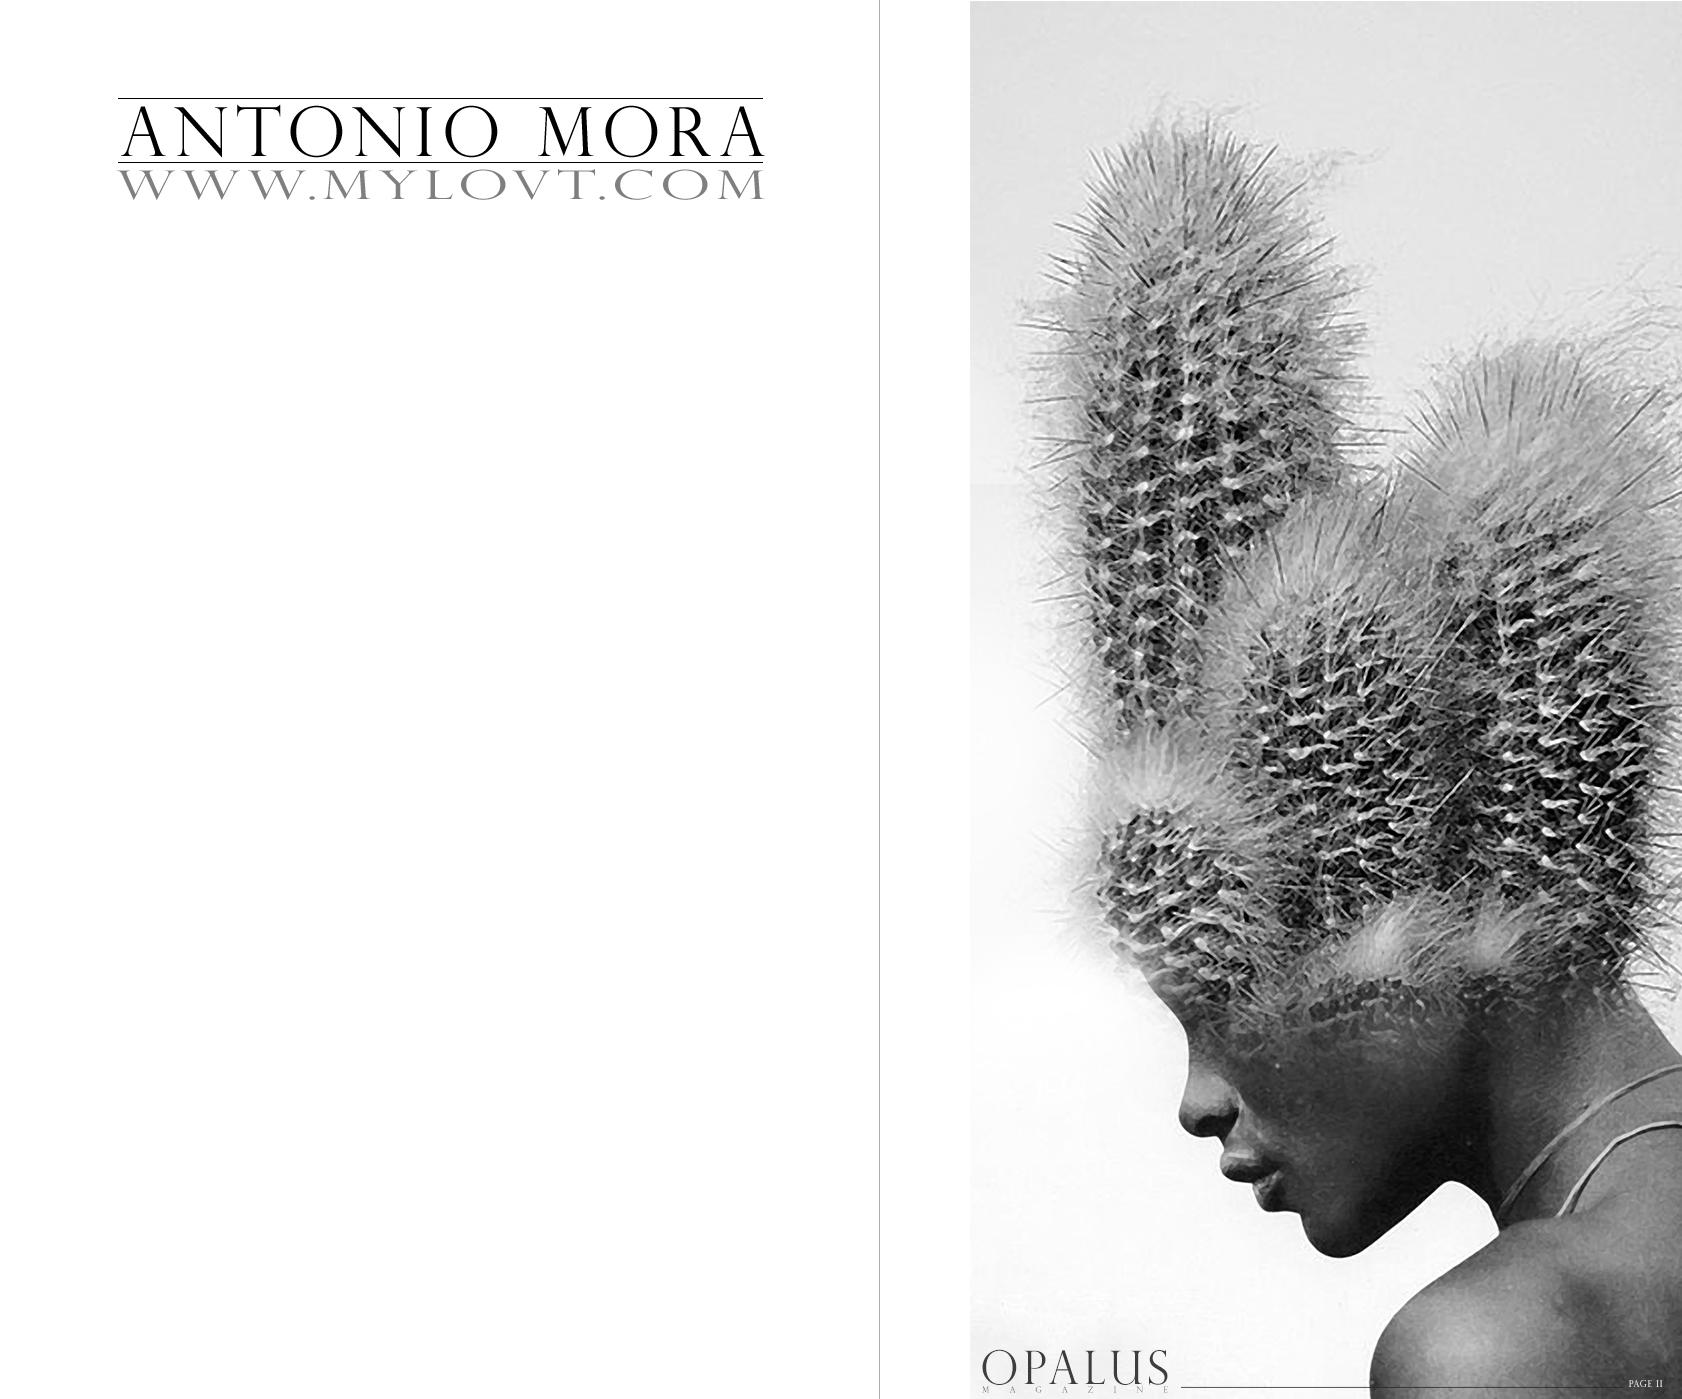 ANTONIO_MORA_page_01.jpg